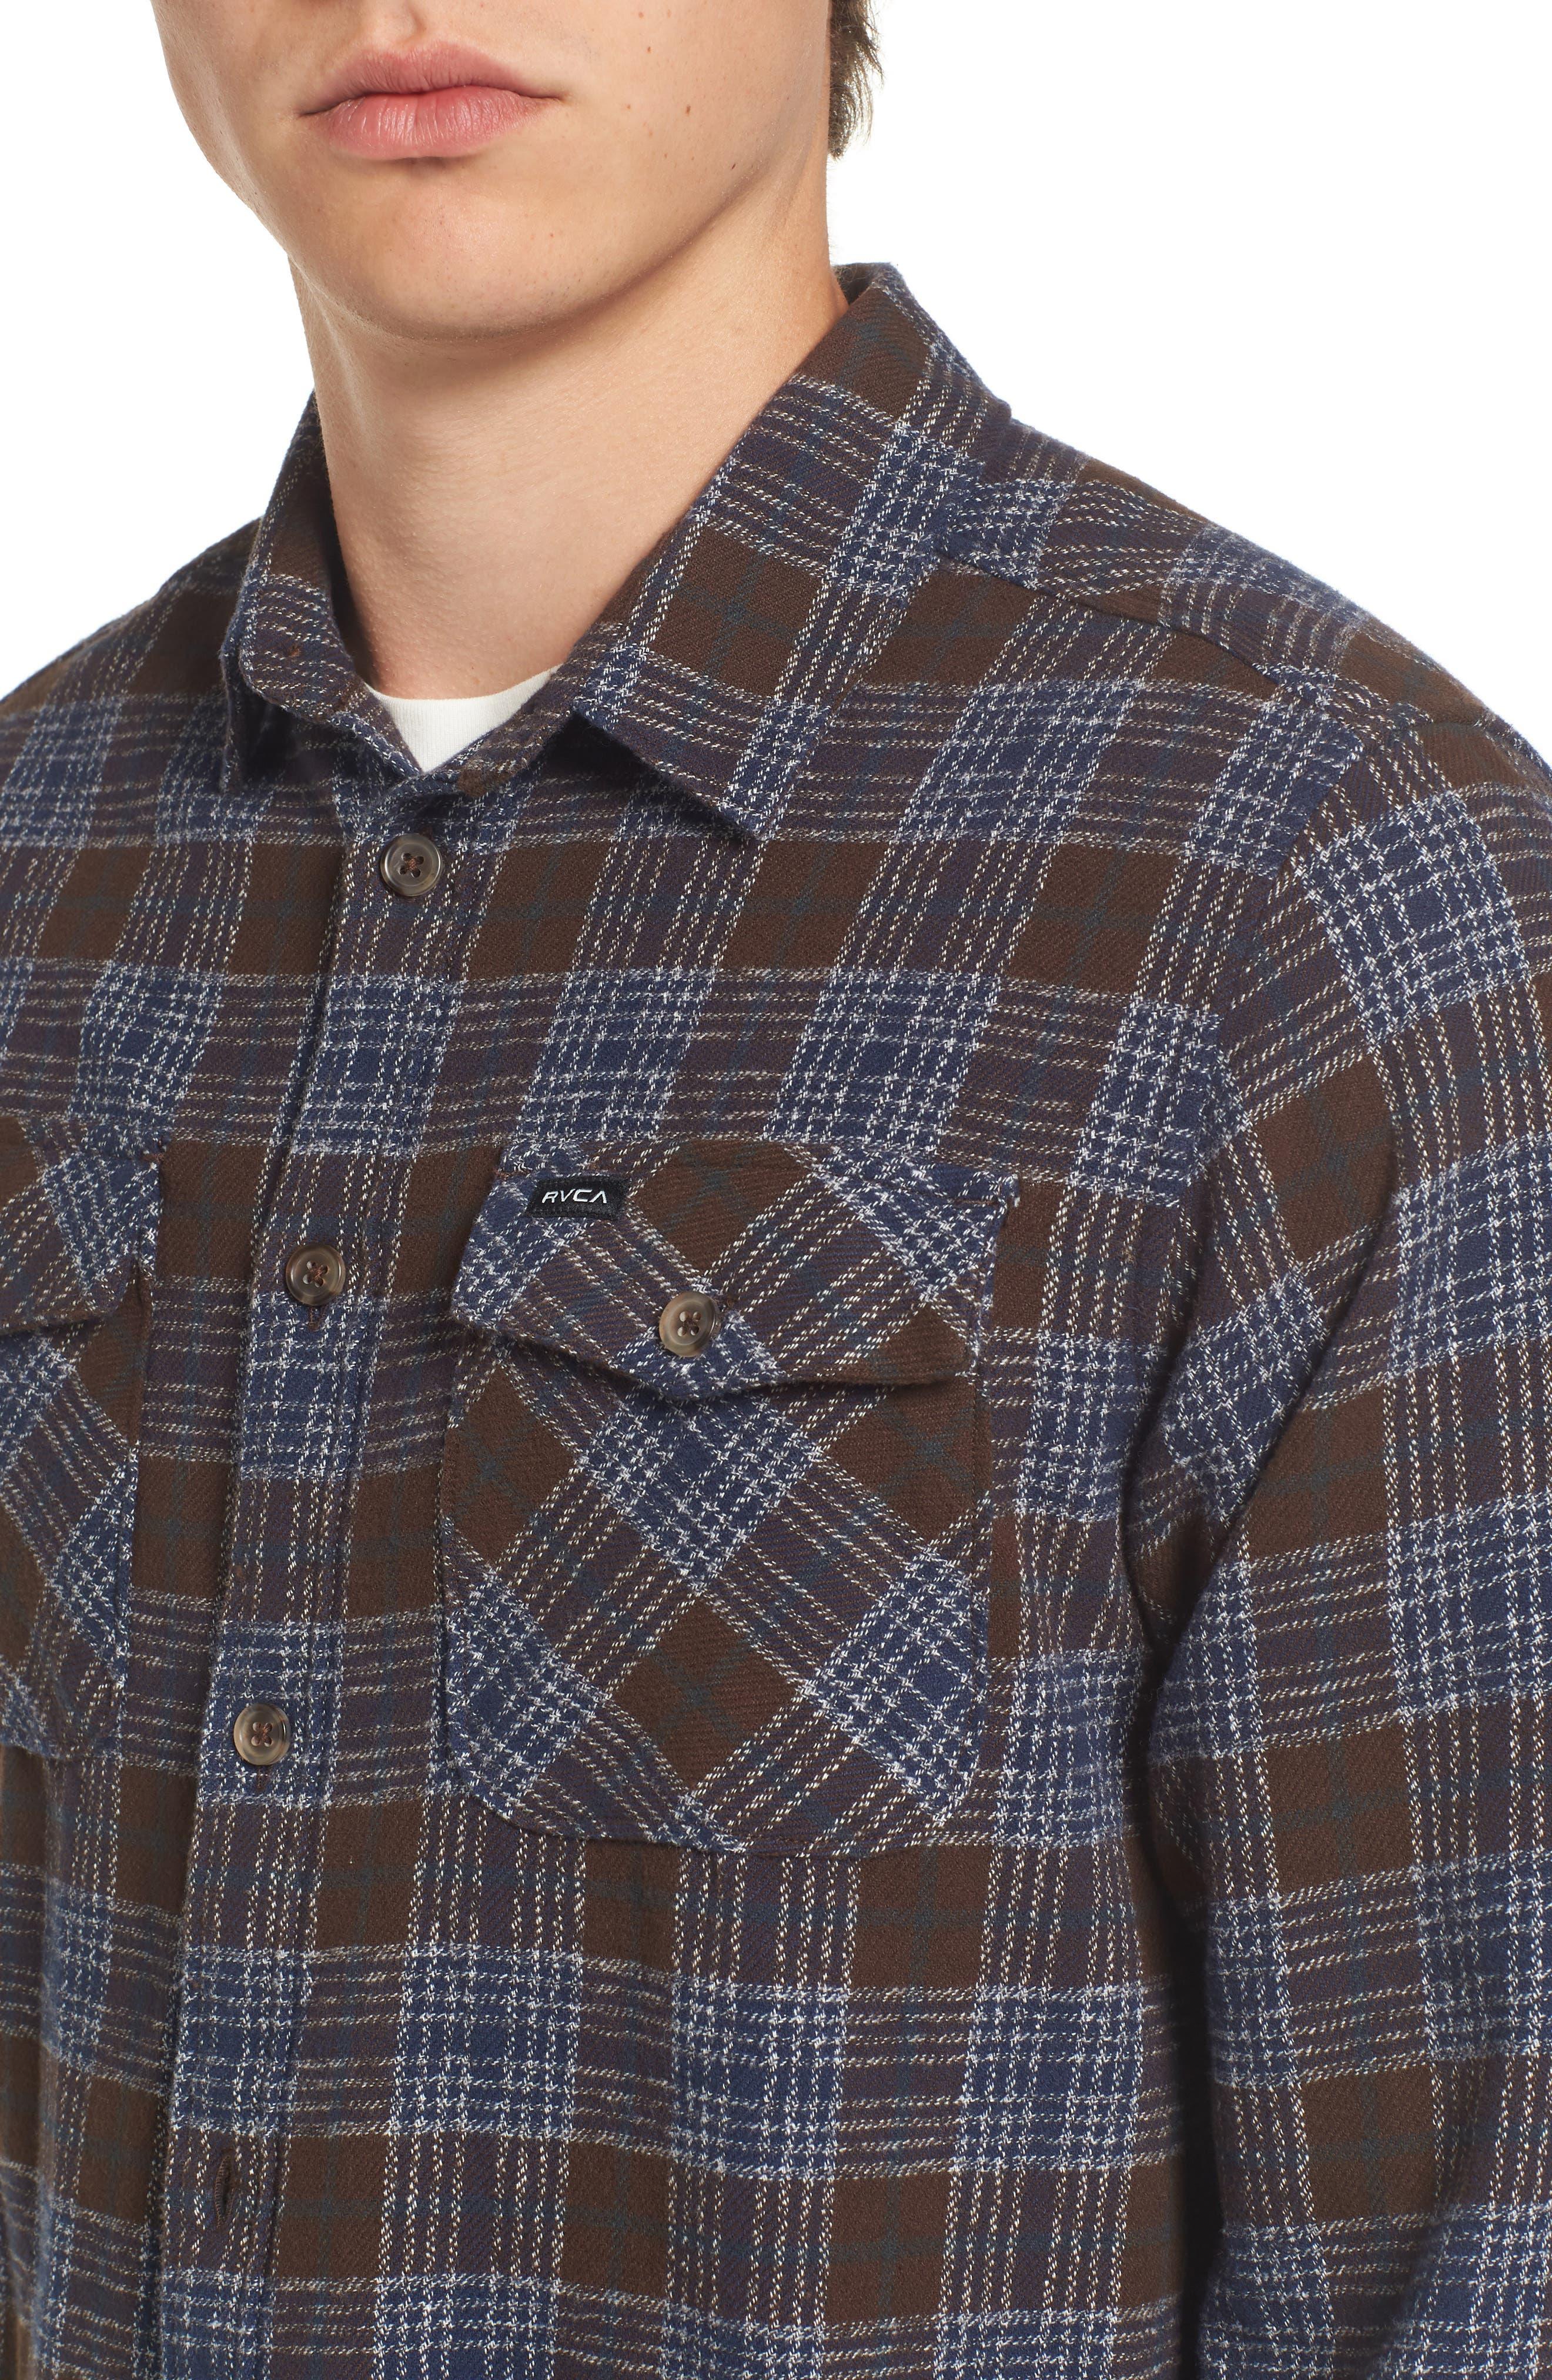 'That'll Work' Trim Fit Plaid Flannel Shirt,                             Alternate thumbnail 26, color,